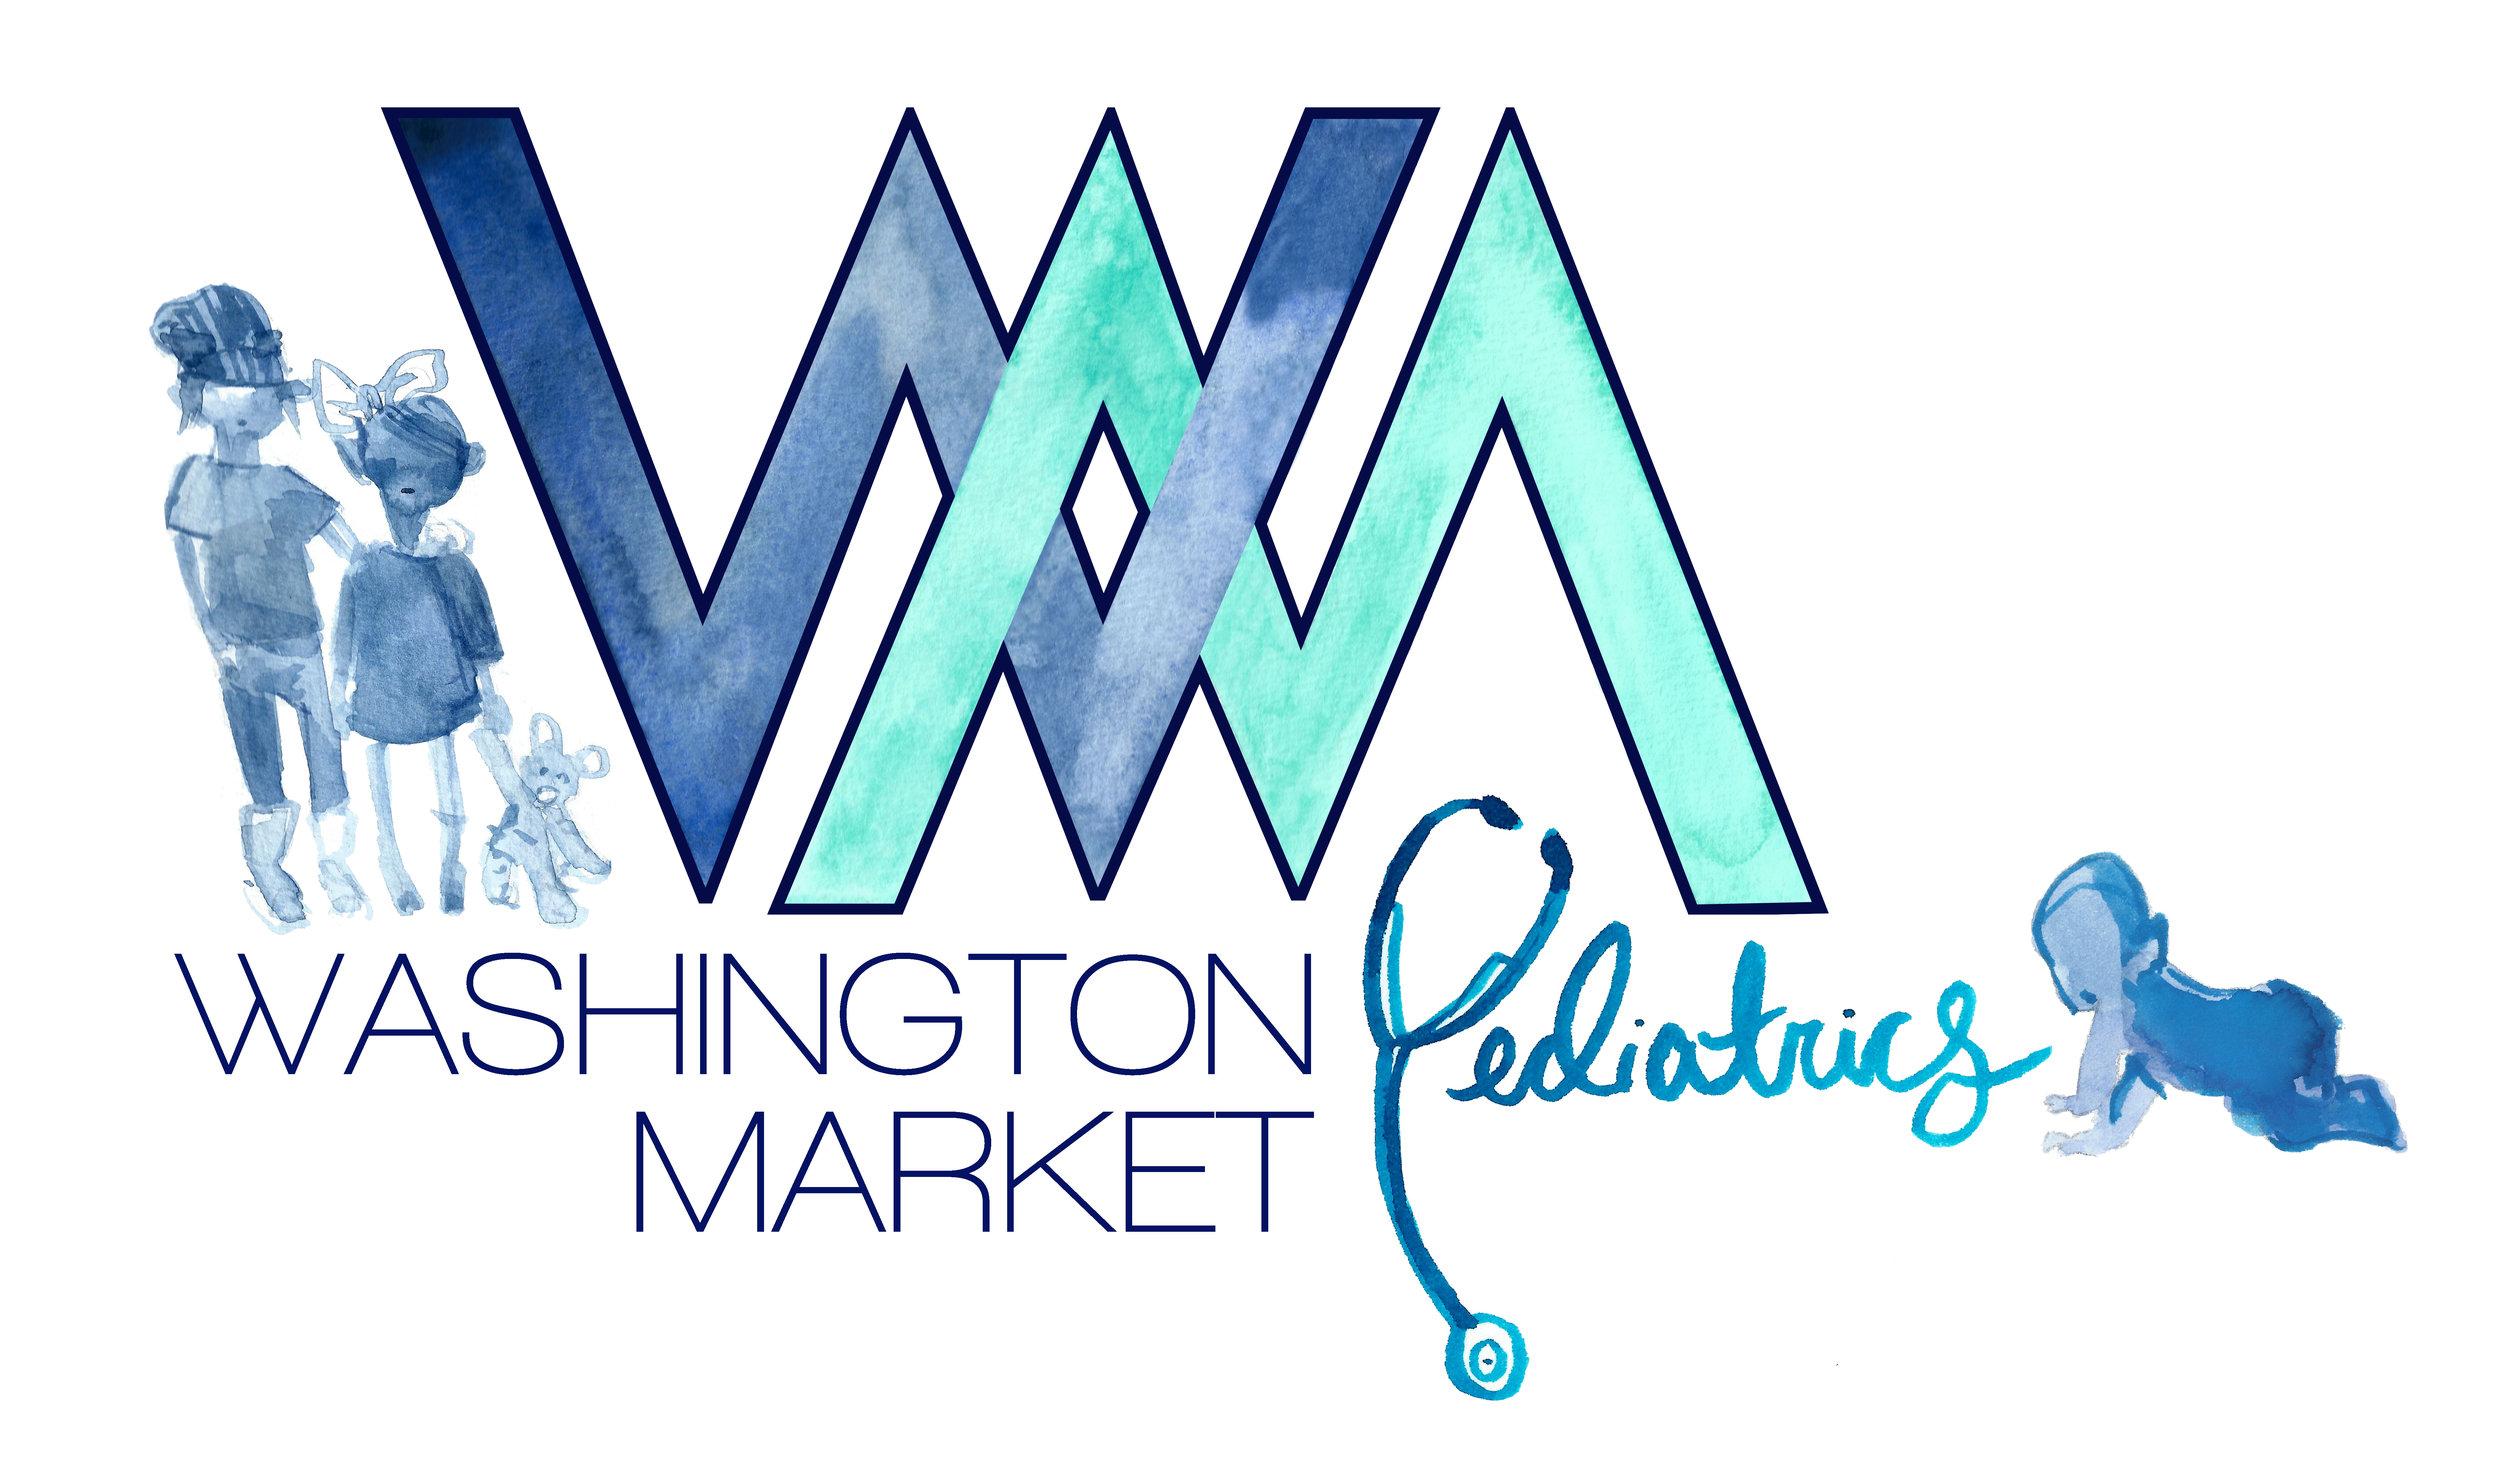 Washington Market Pediatrics.jpg